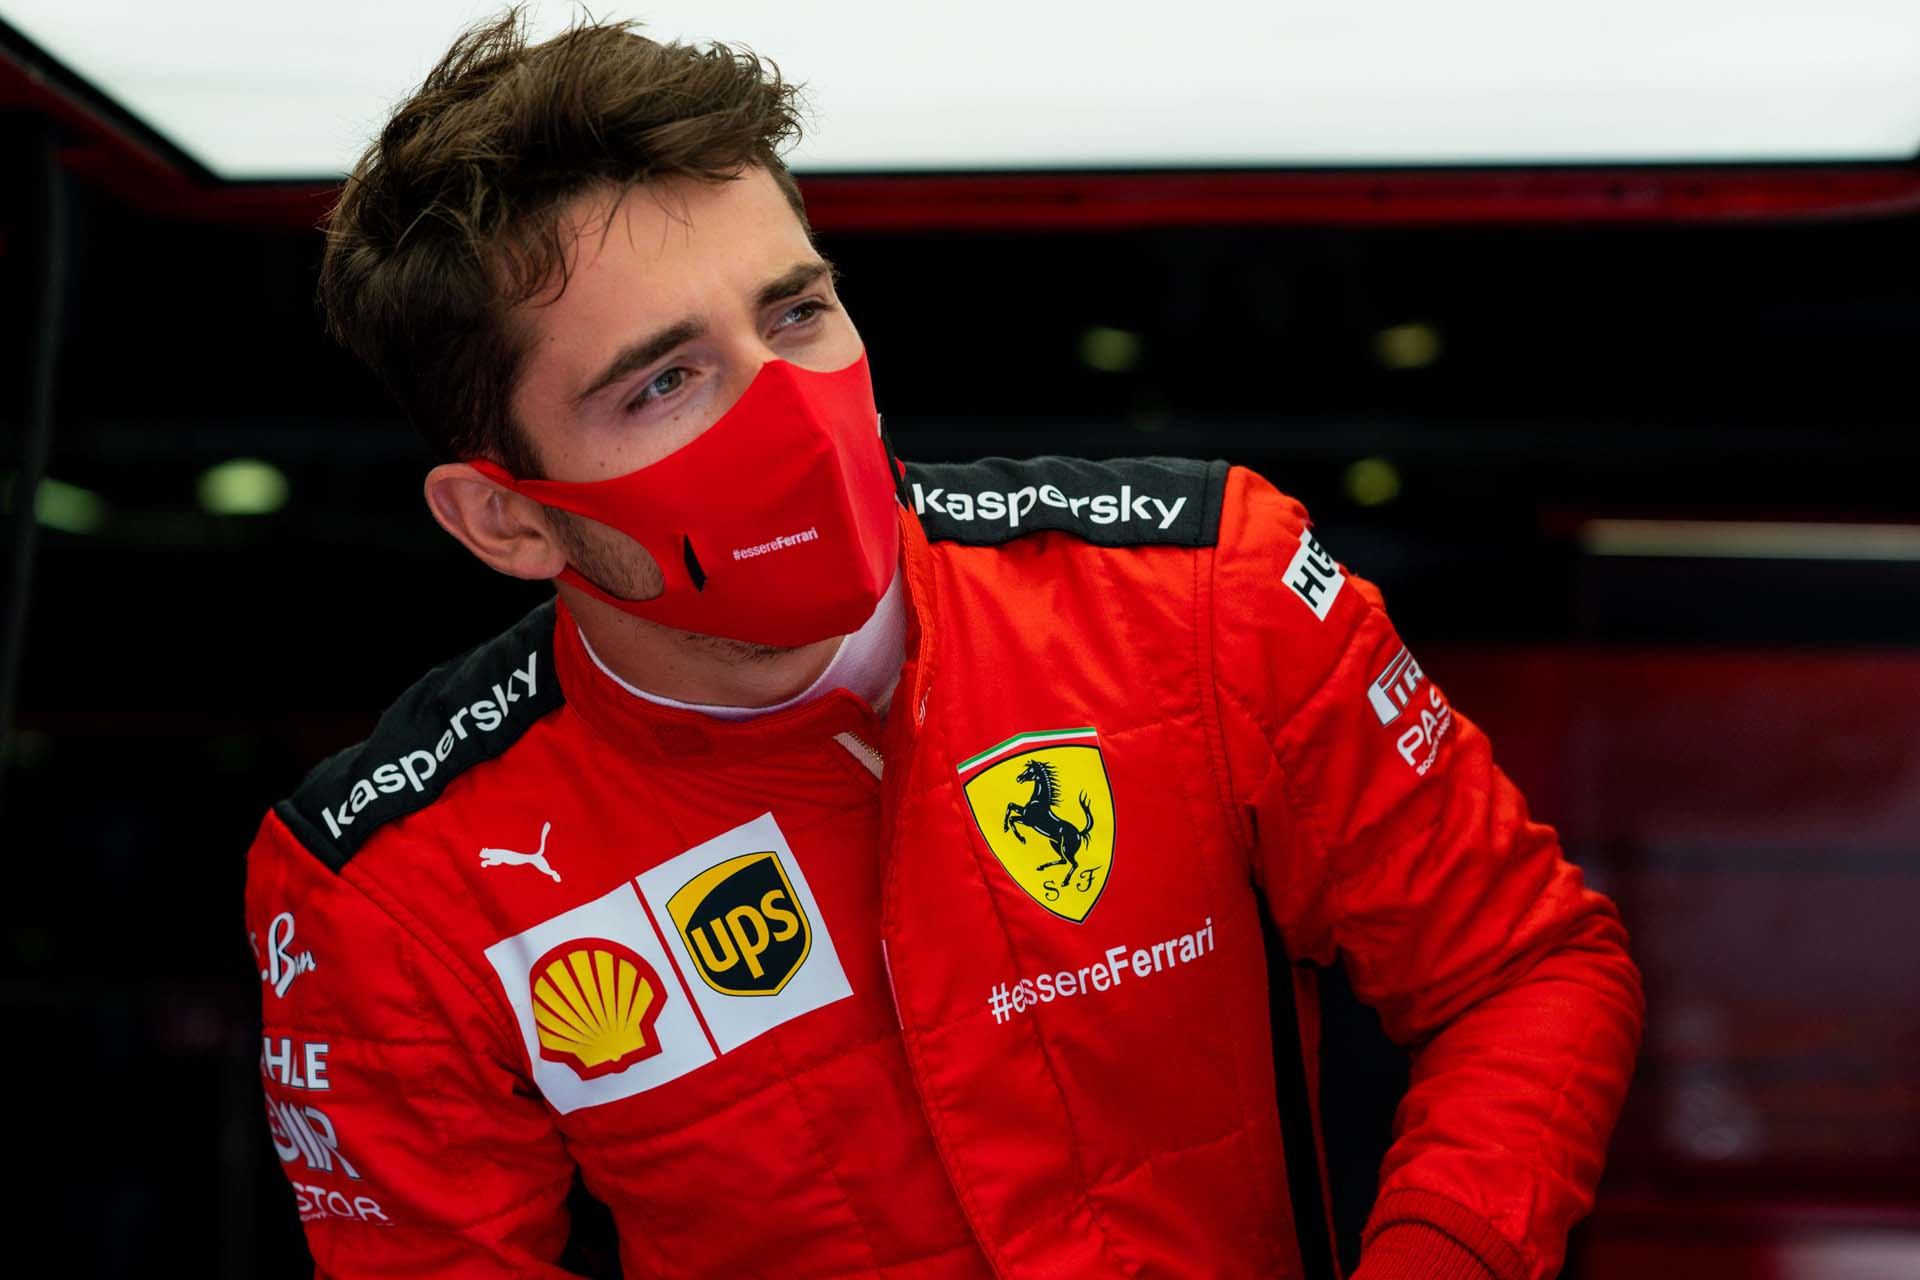 GP ITALIA F1/2020 -  GIOVEDI 03/09/2020